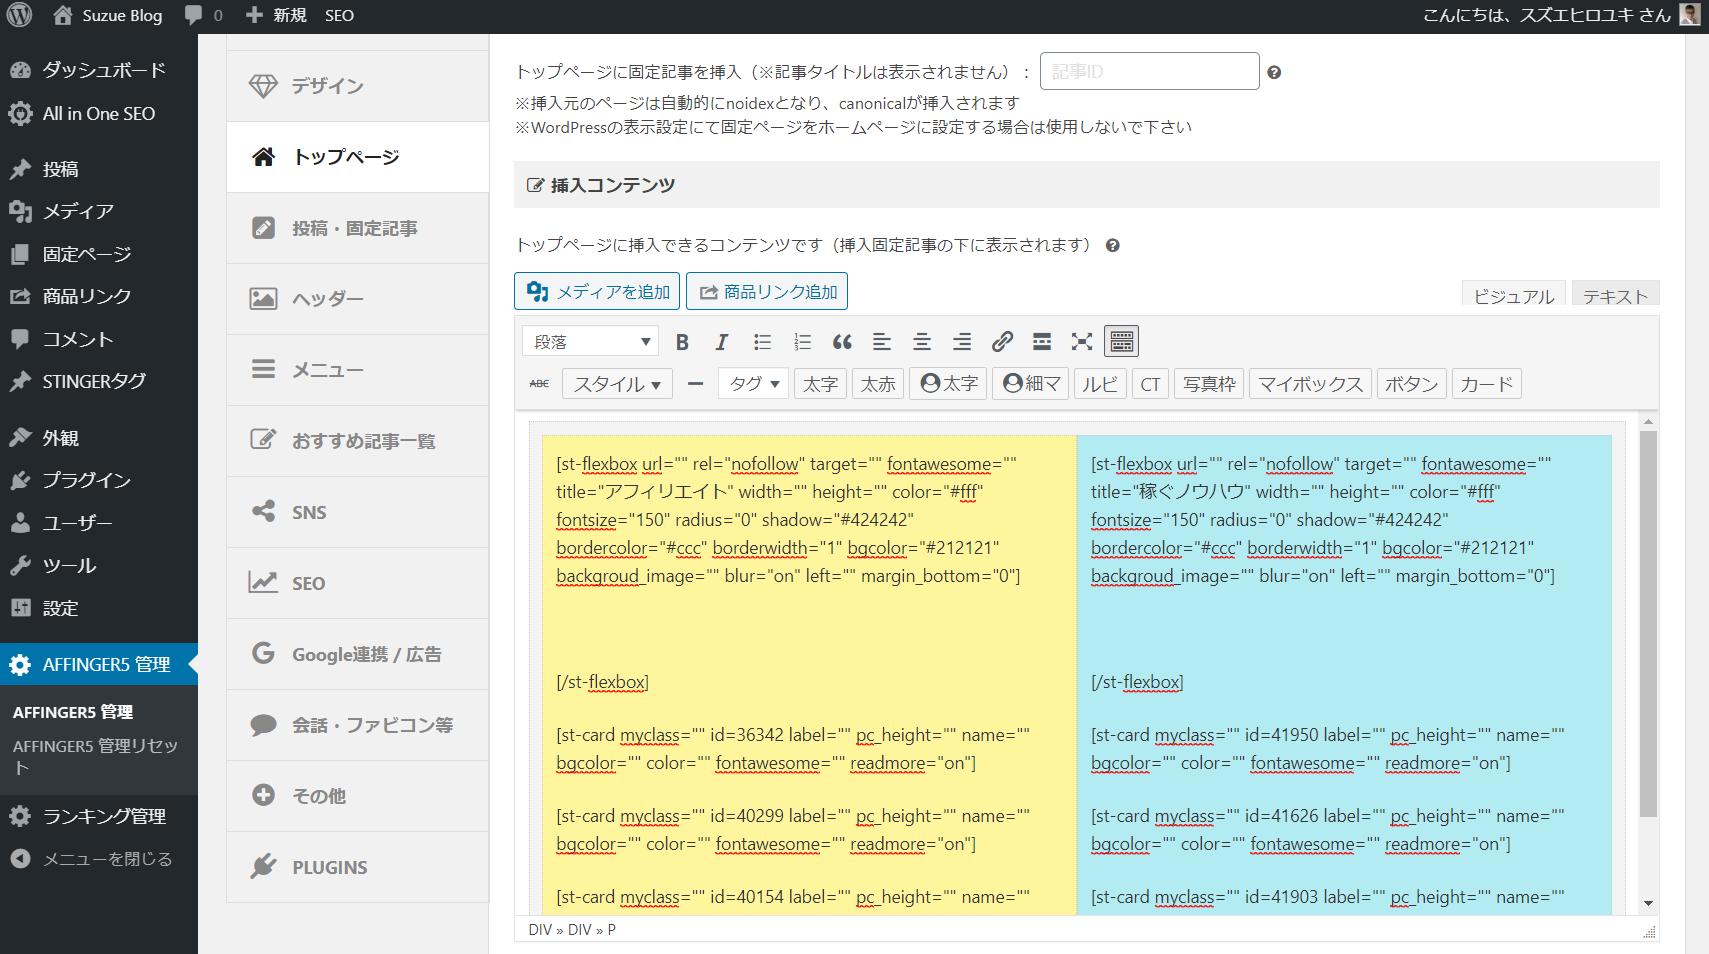 AFFINGER5の管理画面の挿入コンテンツ枠完成の画像